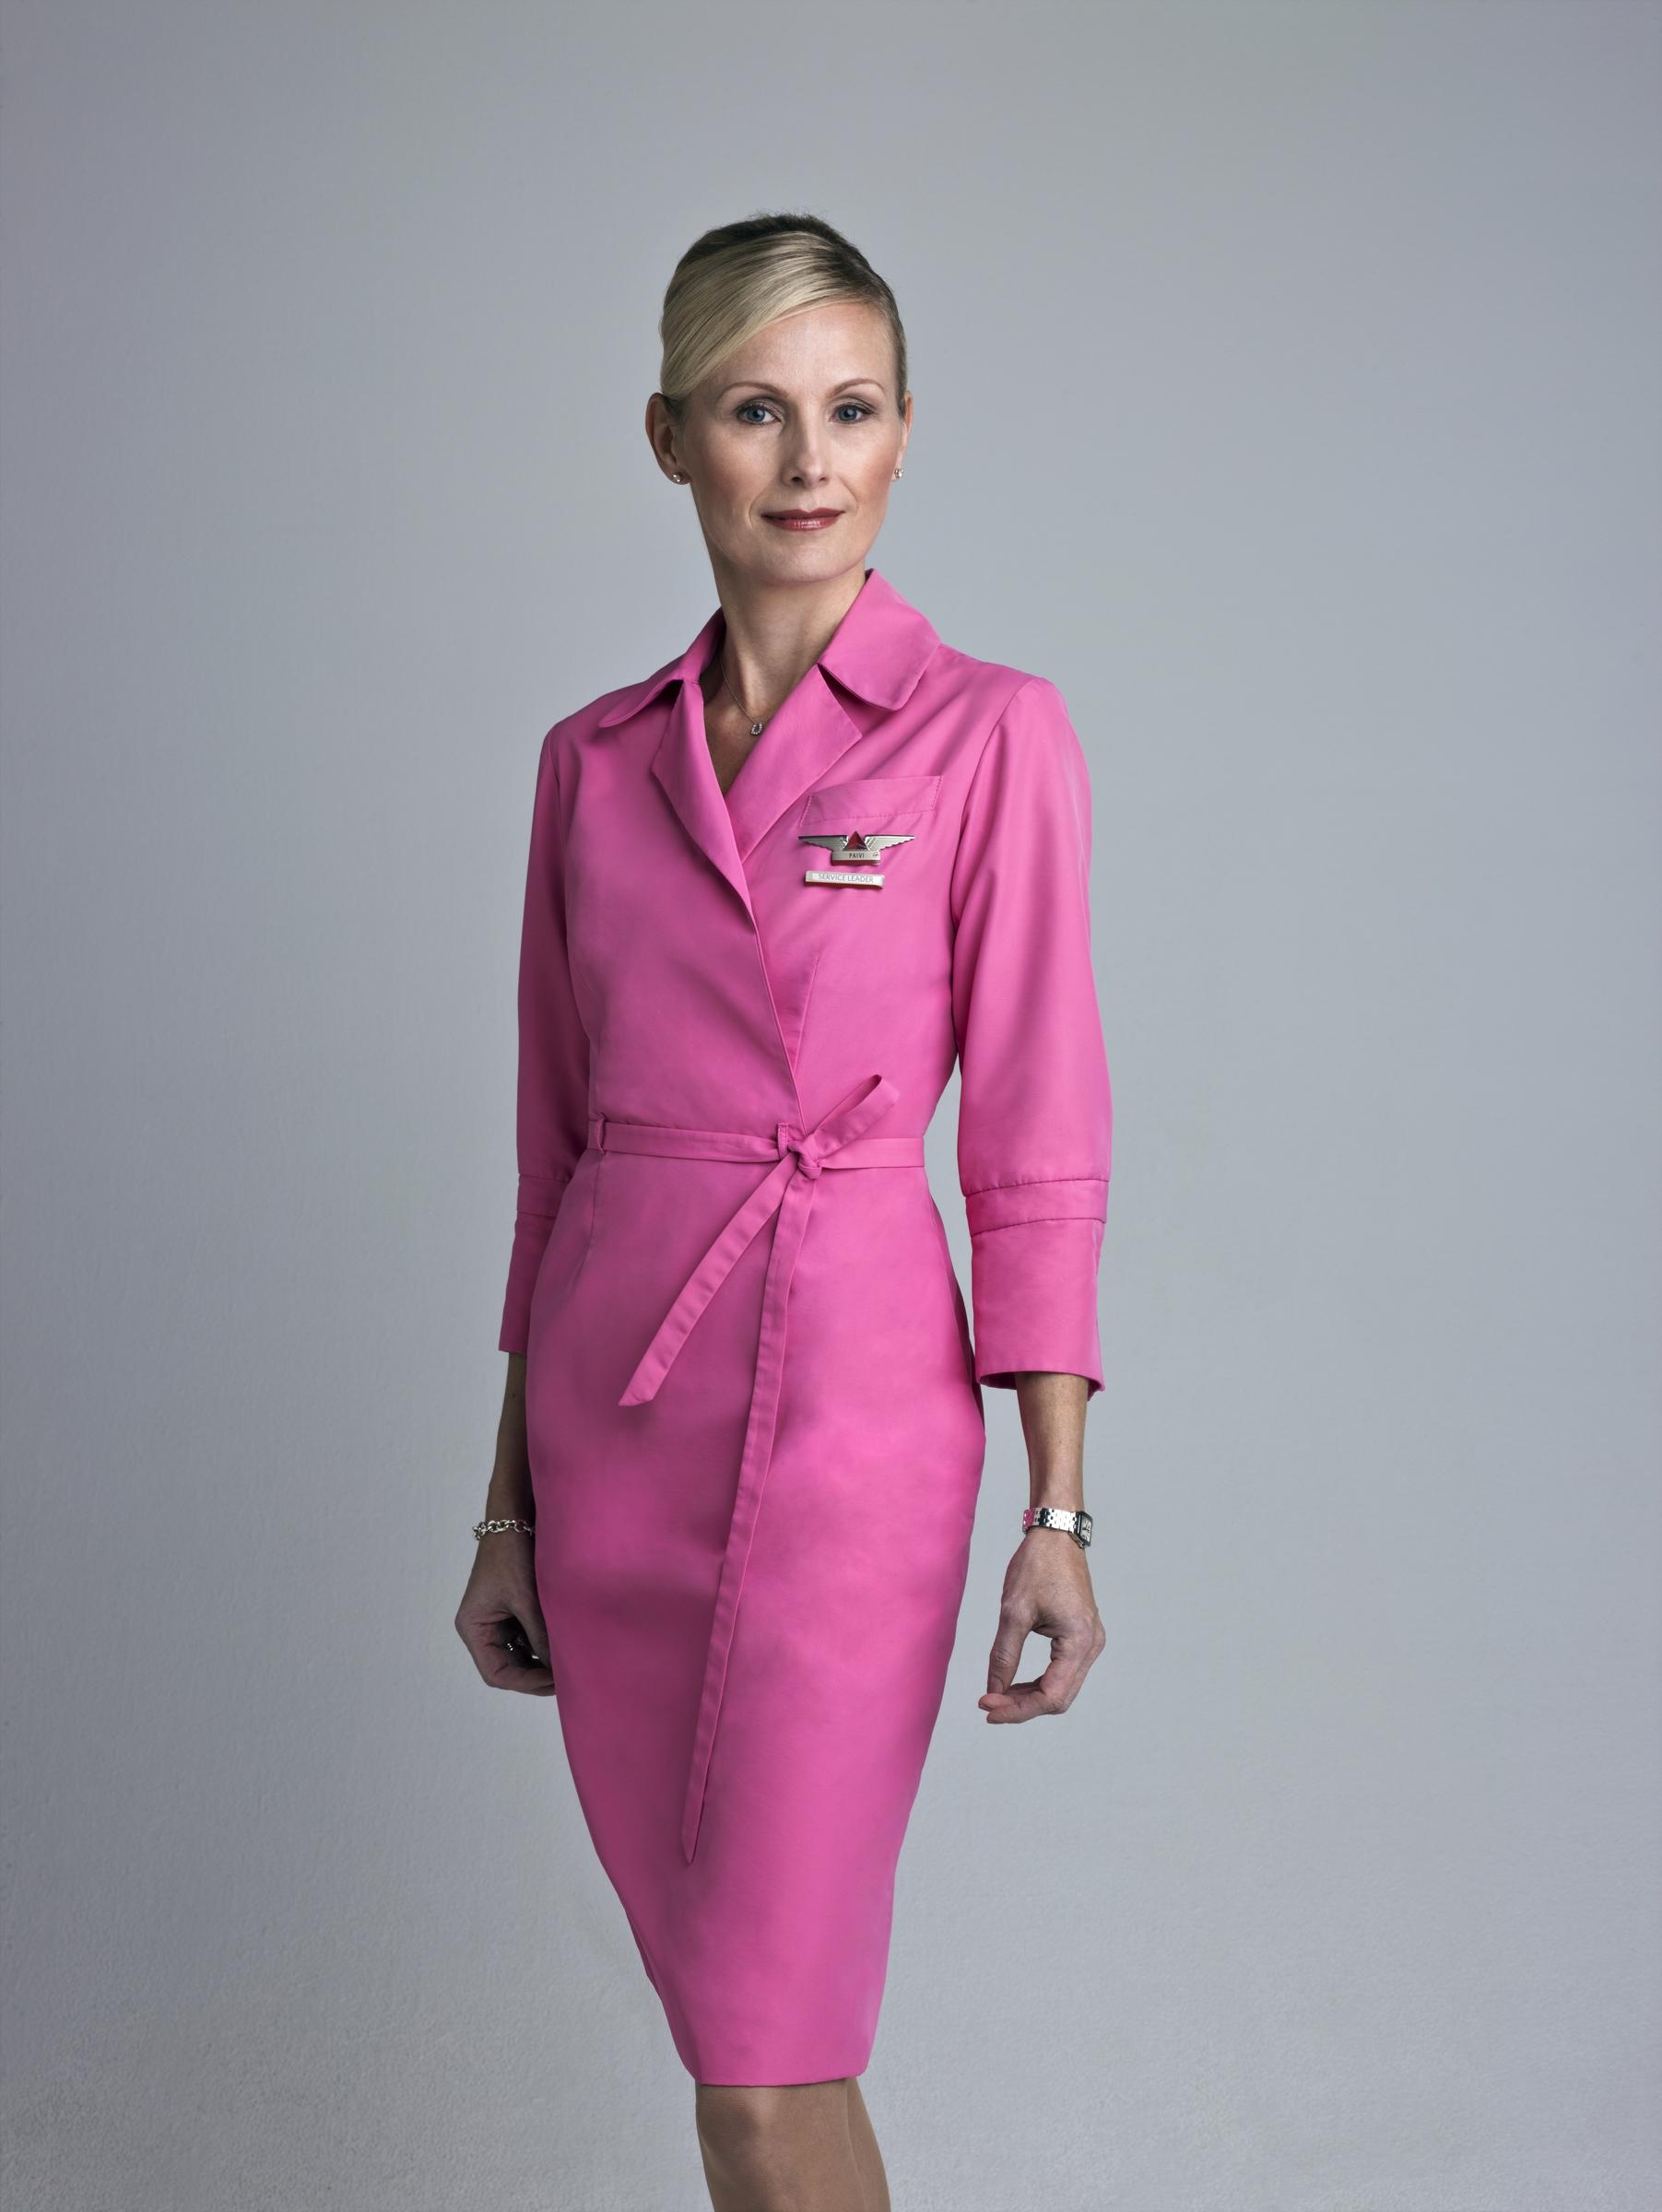 a6c1f47267da0 One little pink dress, one huge statement | Delta News Hub